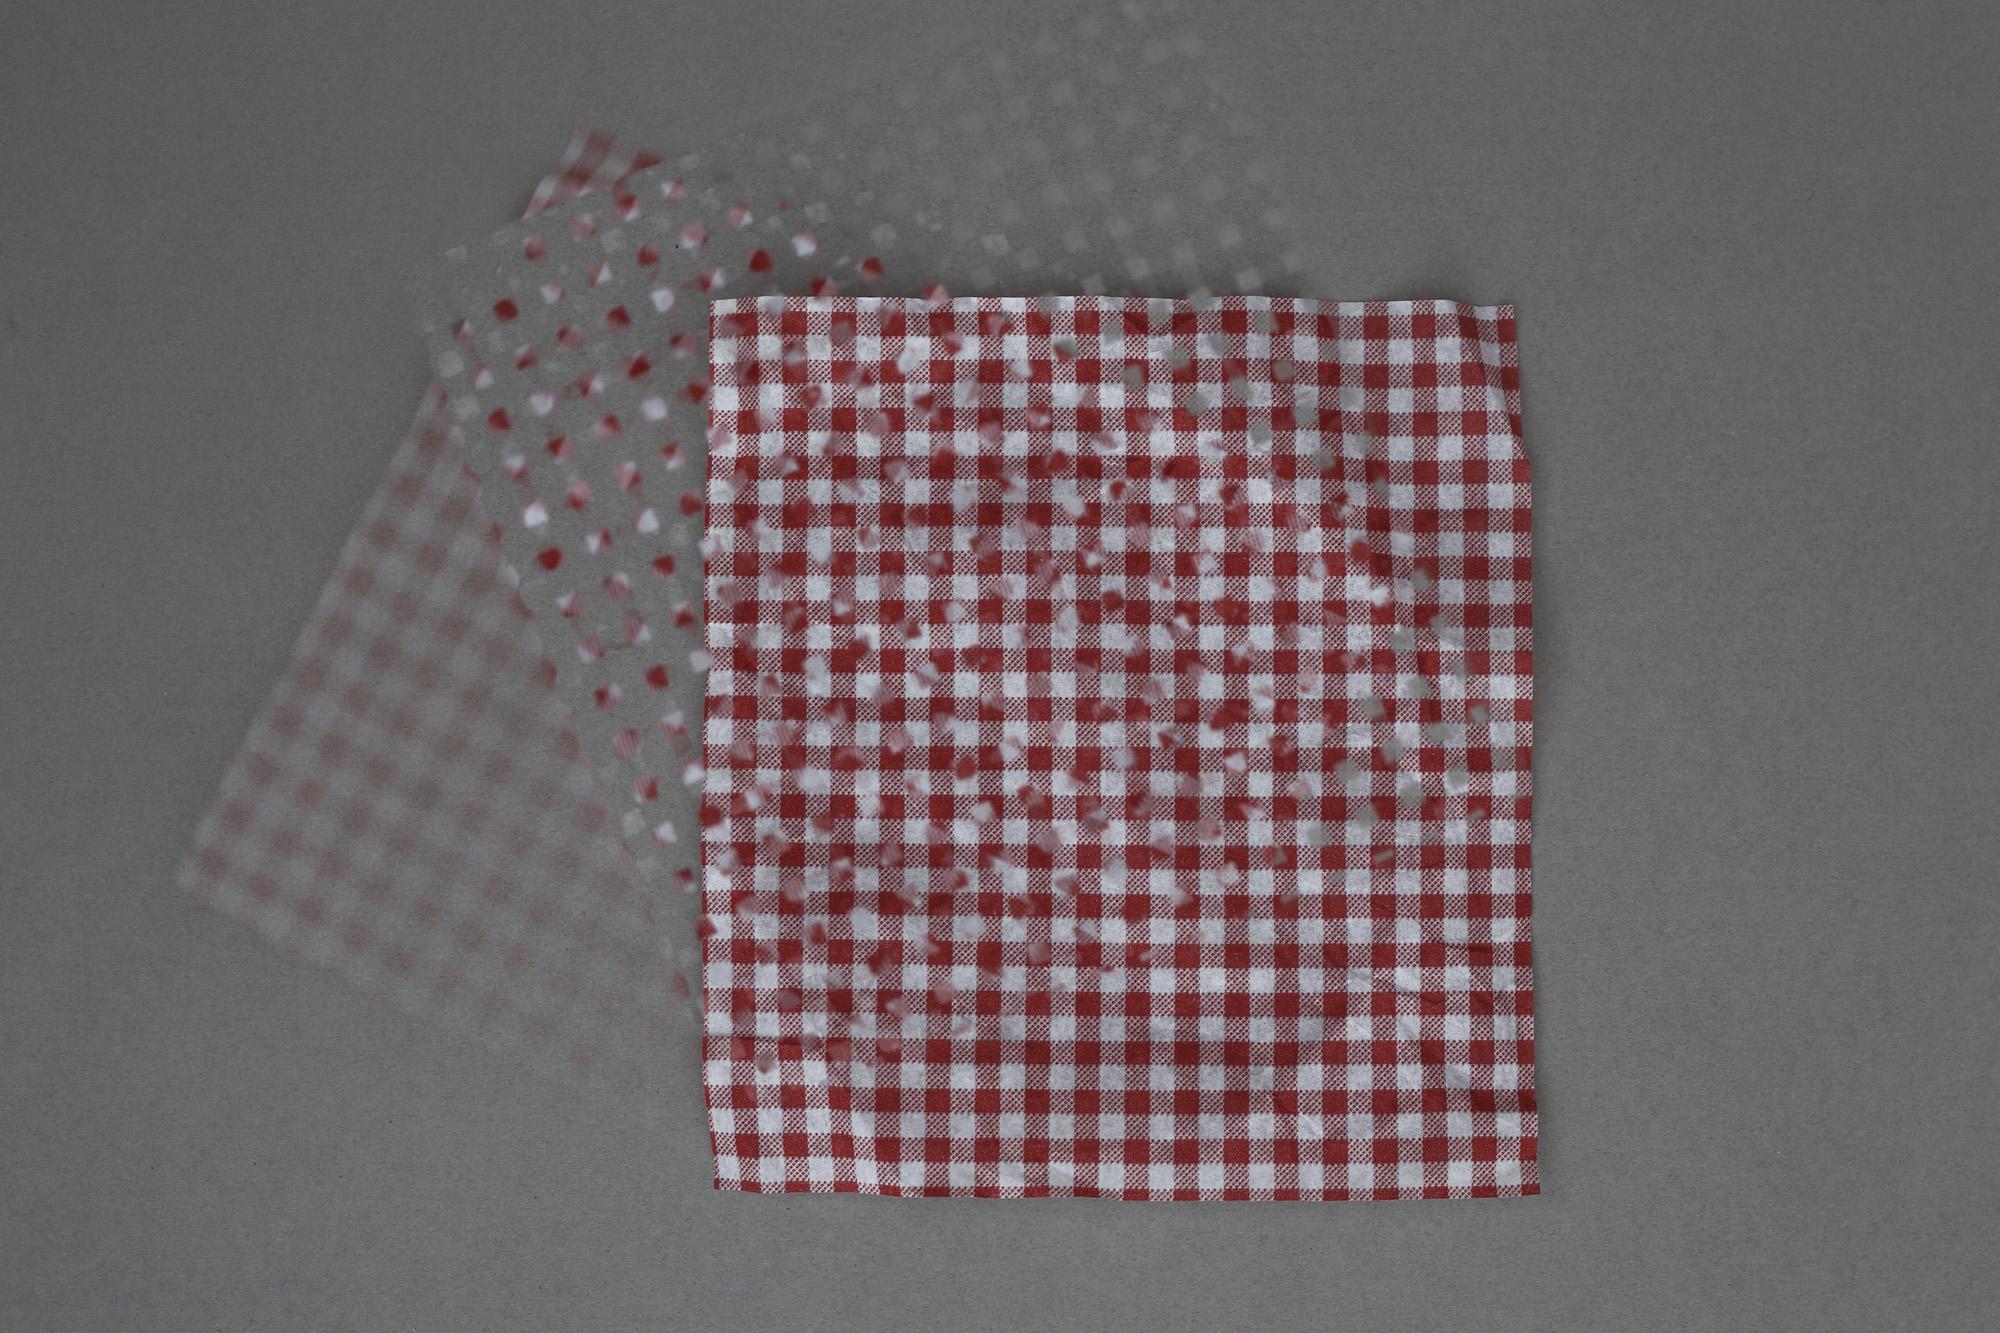 Unwrapped-40.jpg